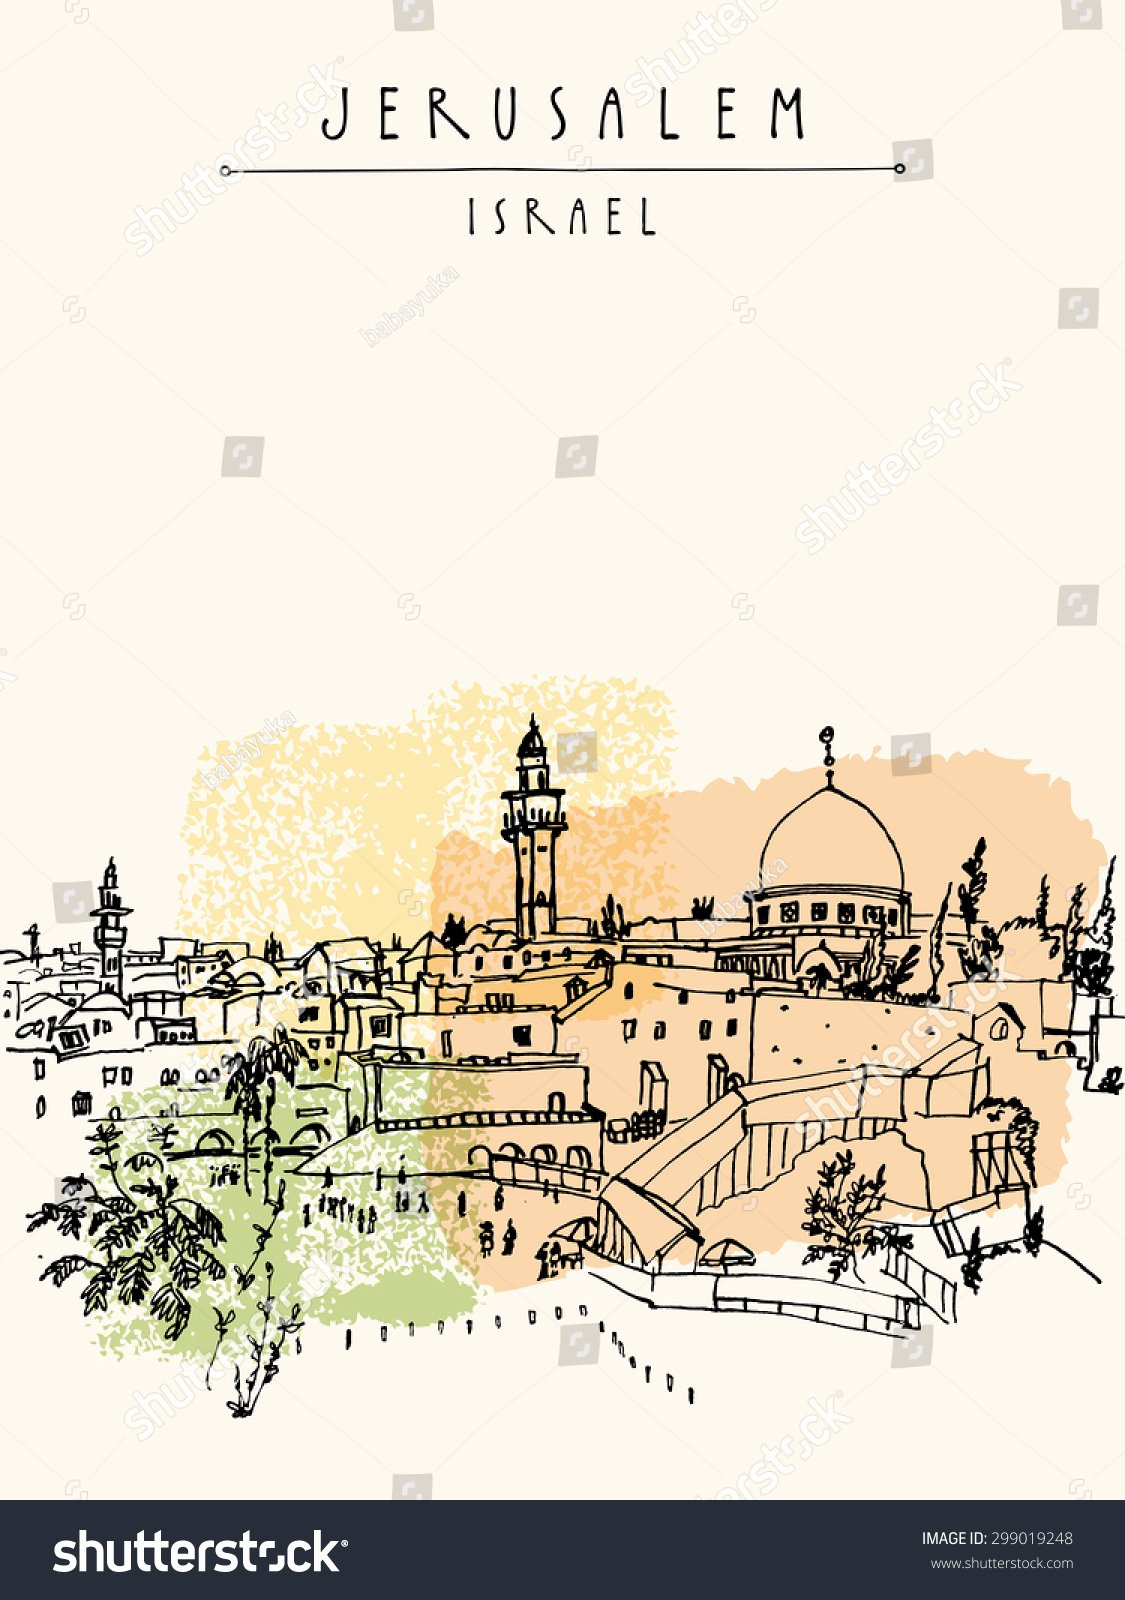 Vertical Postcard Layout Fresh Wailing Wall In Jerusalem israel Handmade Vector Drawing